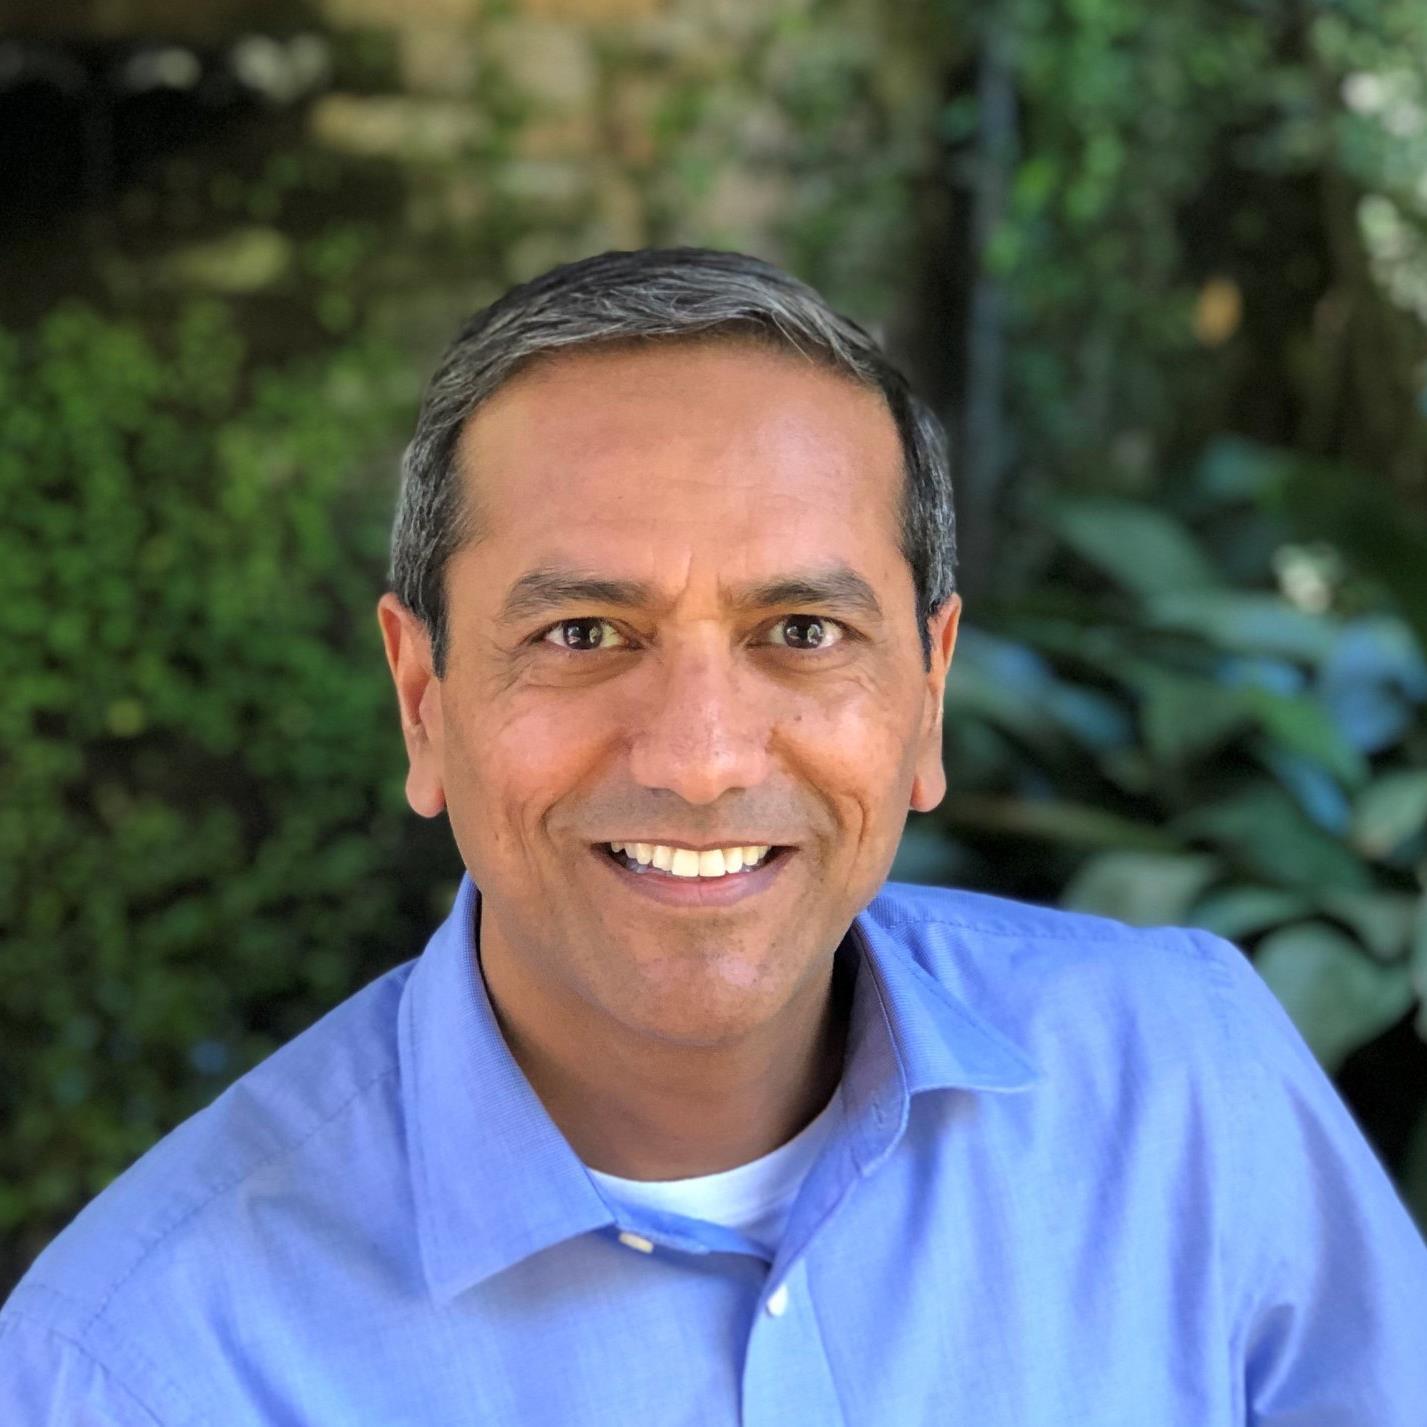 Jay Gupta_photo 2020 3.jpg